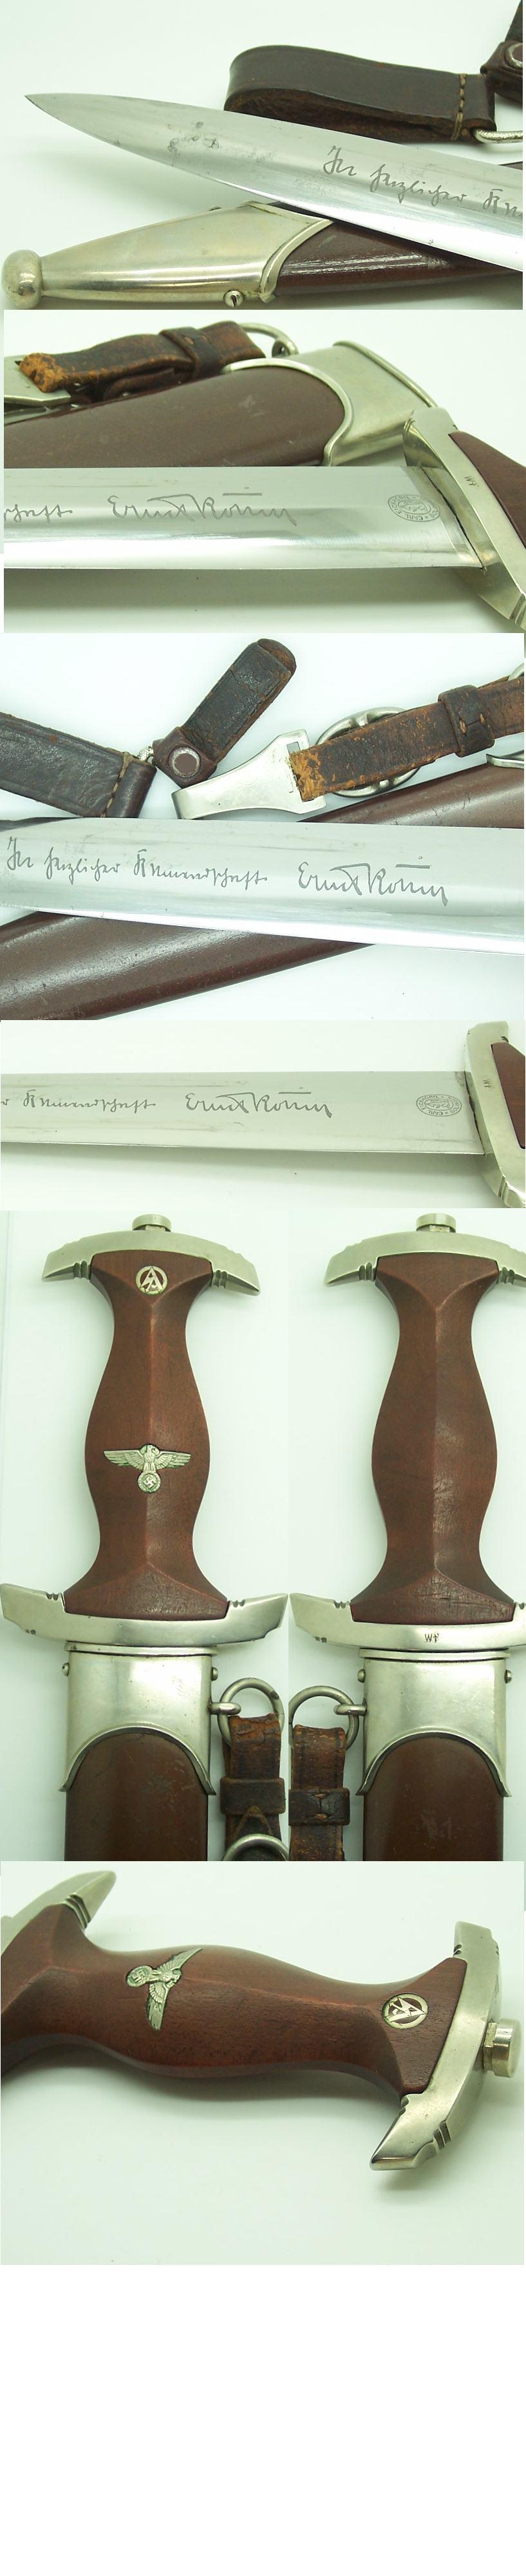 Full Röhm SA Dagger by C. Eickhorn